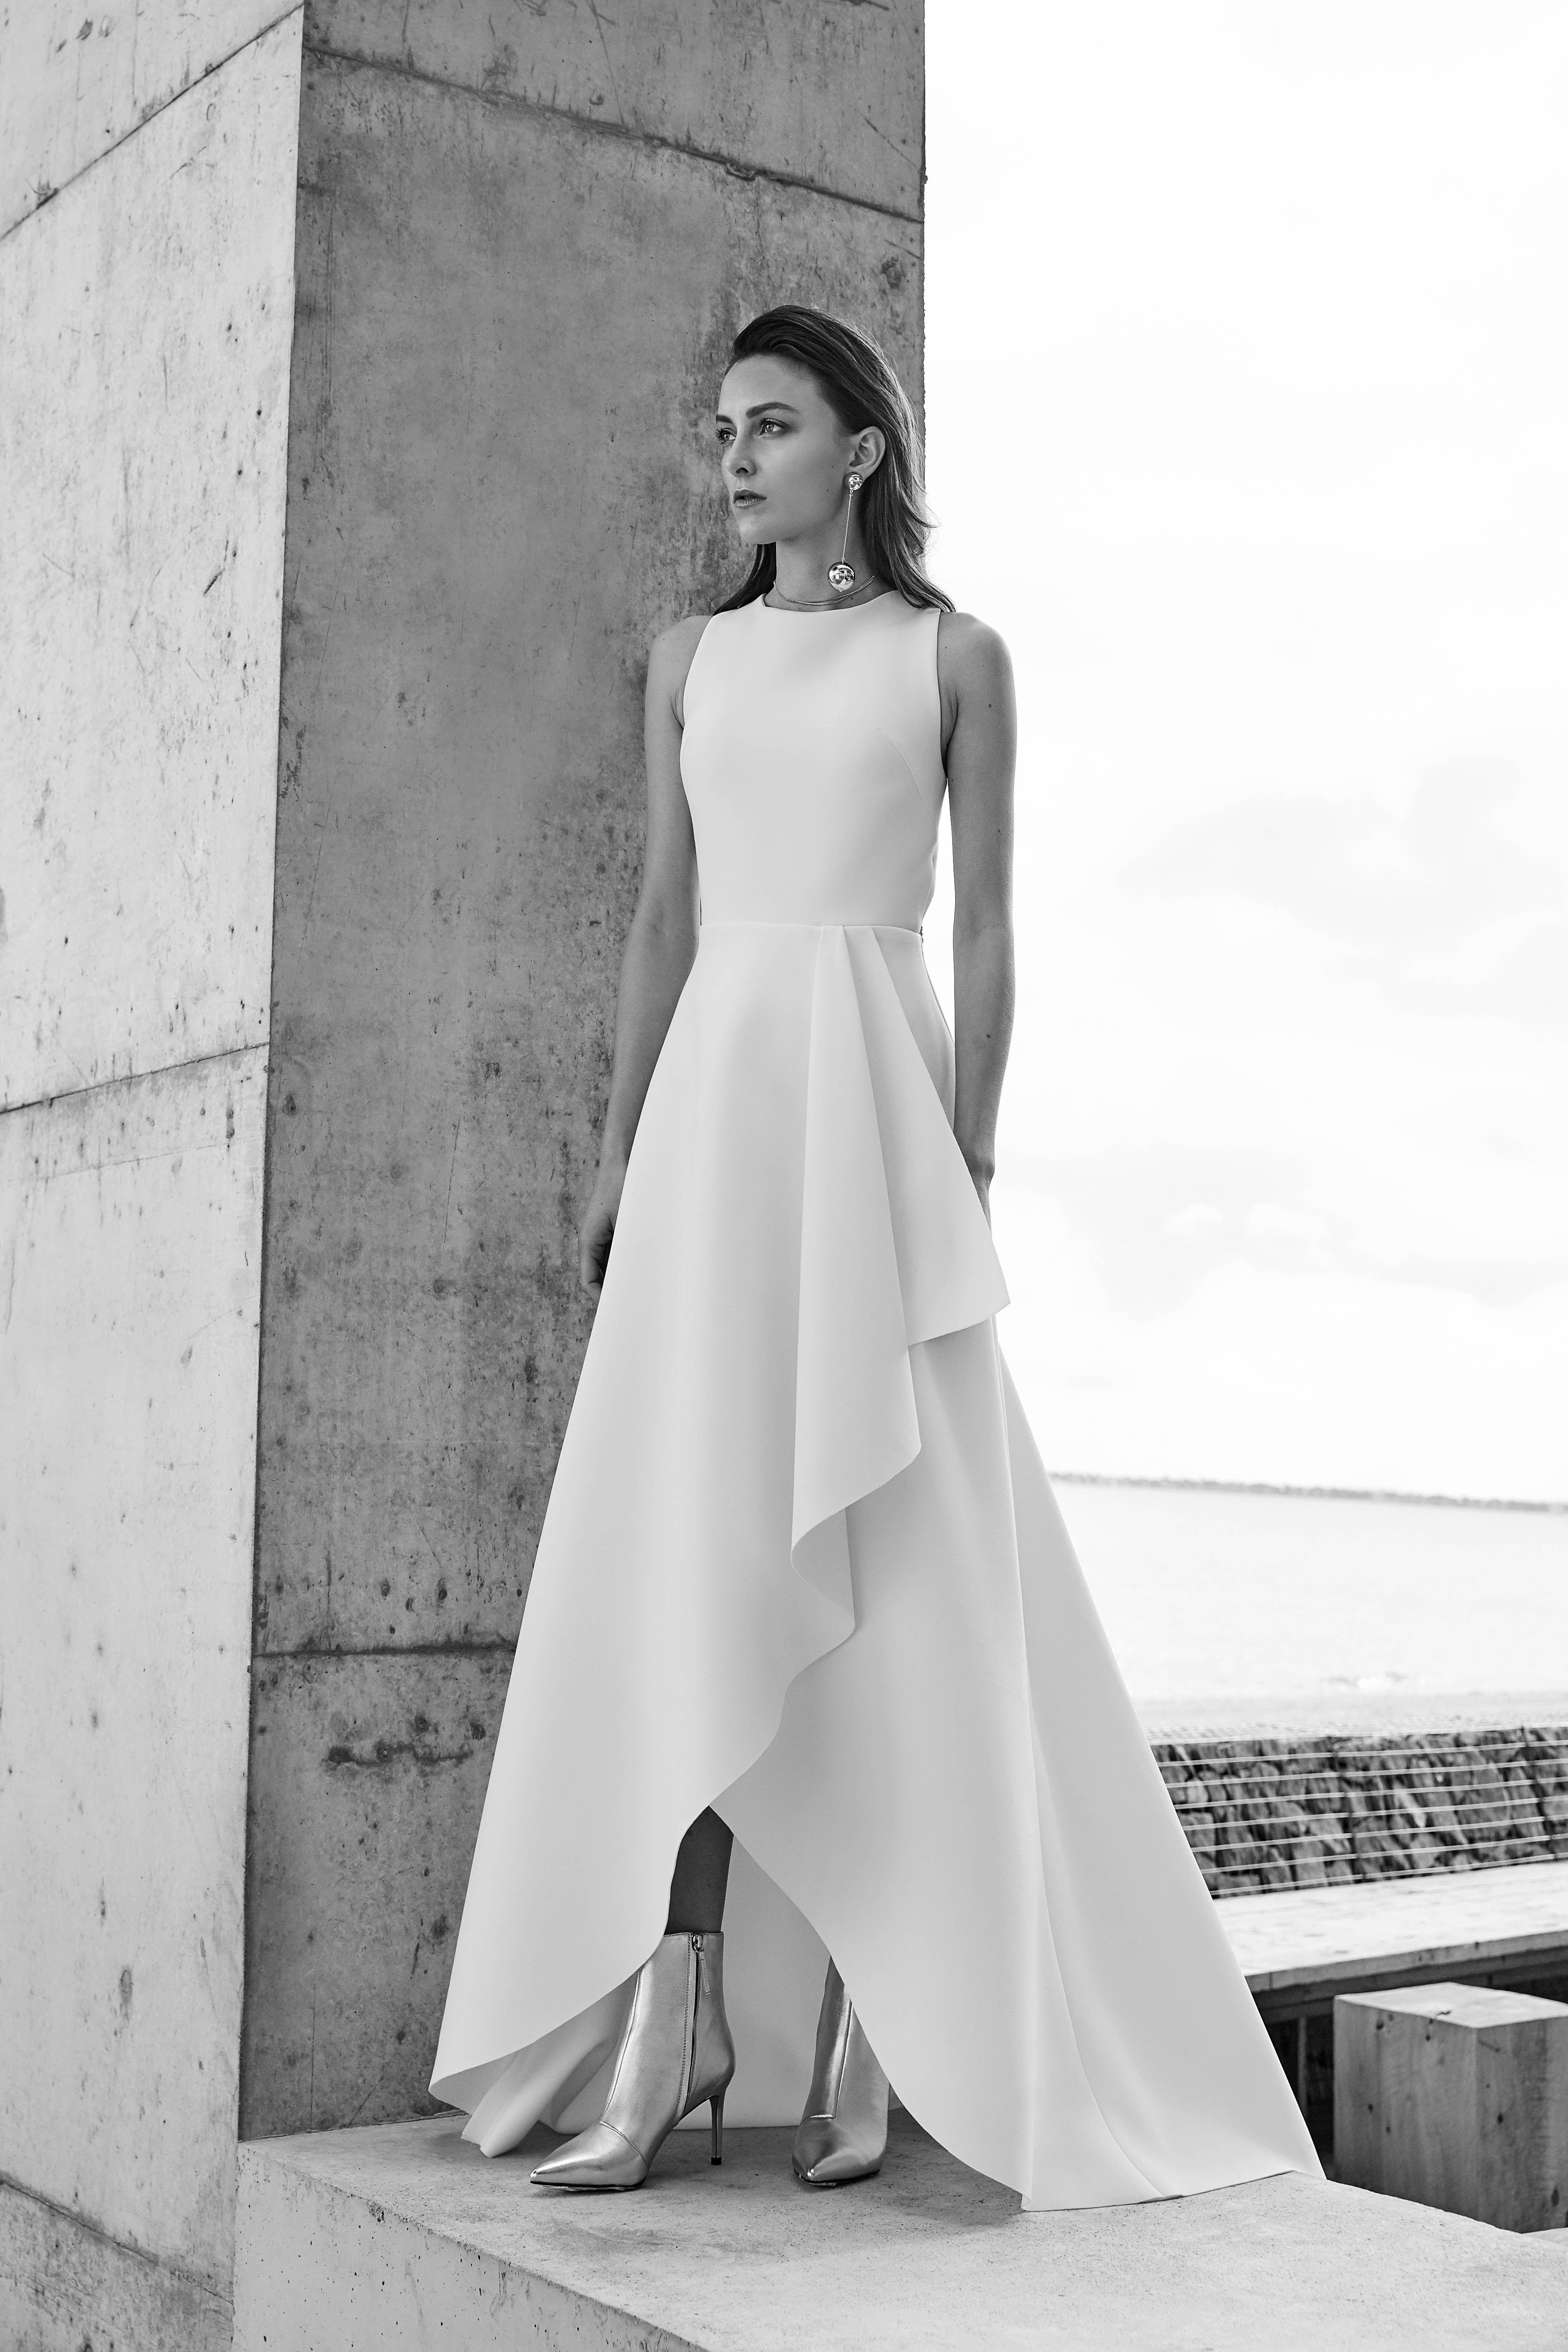 East modern bride pinterest wedding dresses wedding and bridal